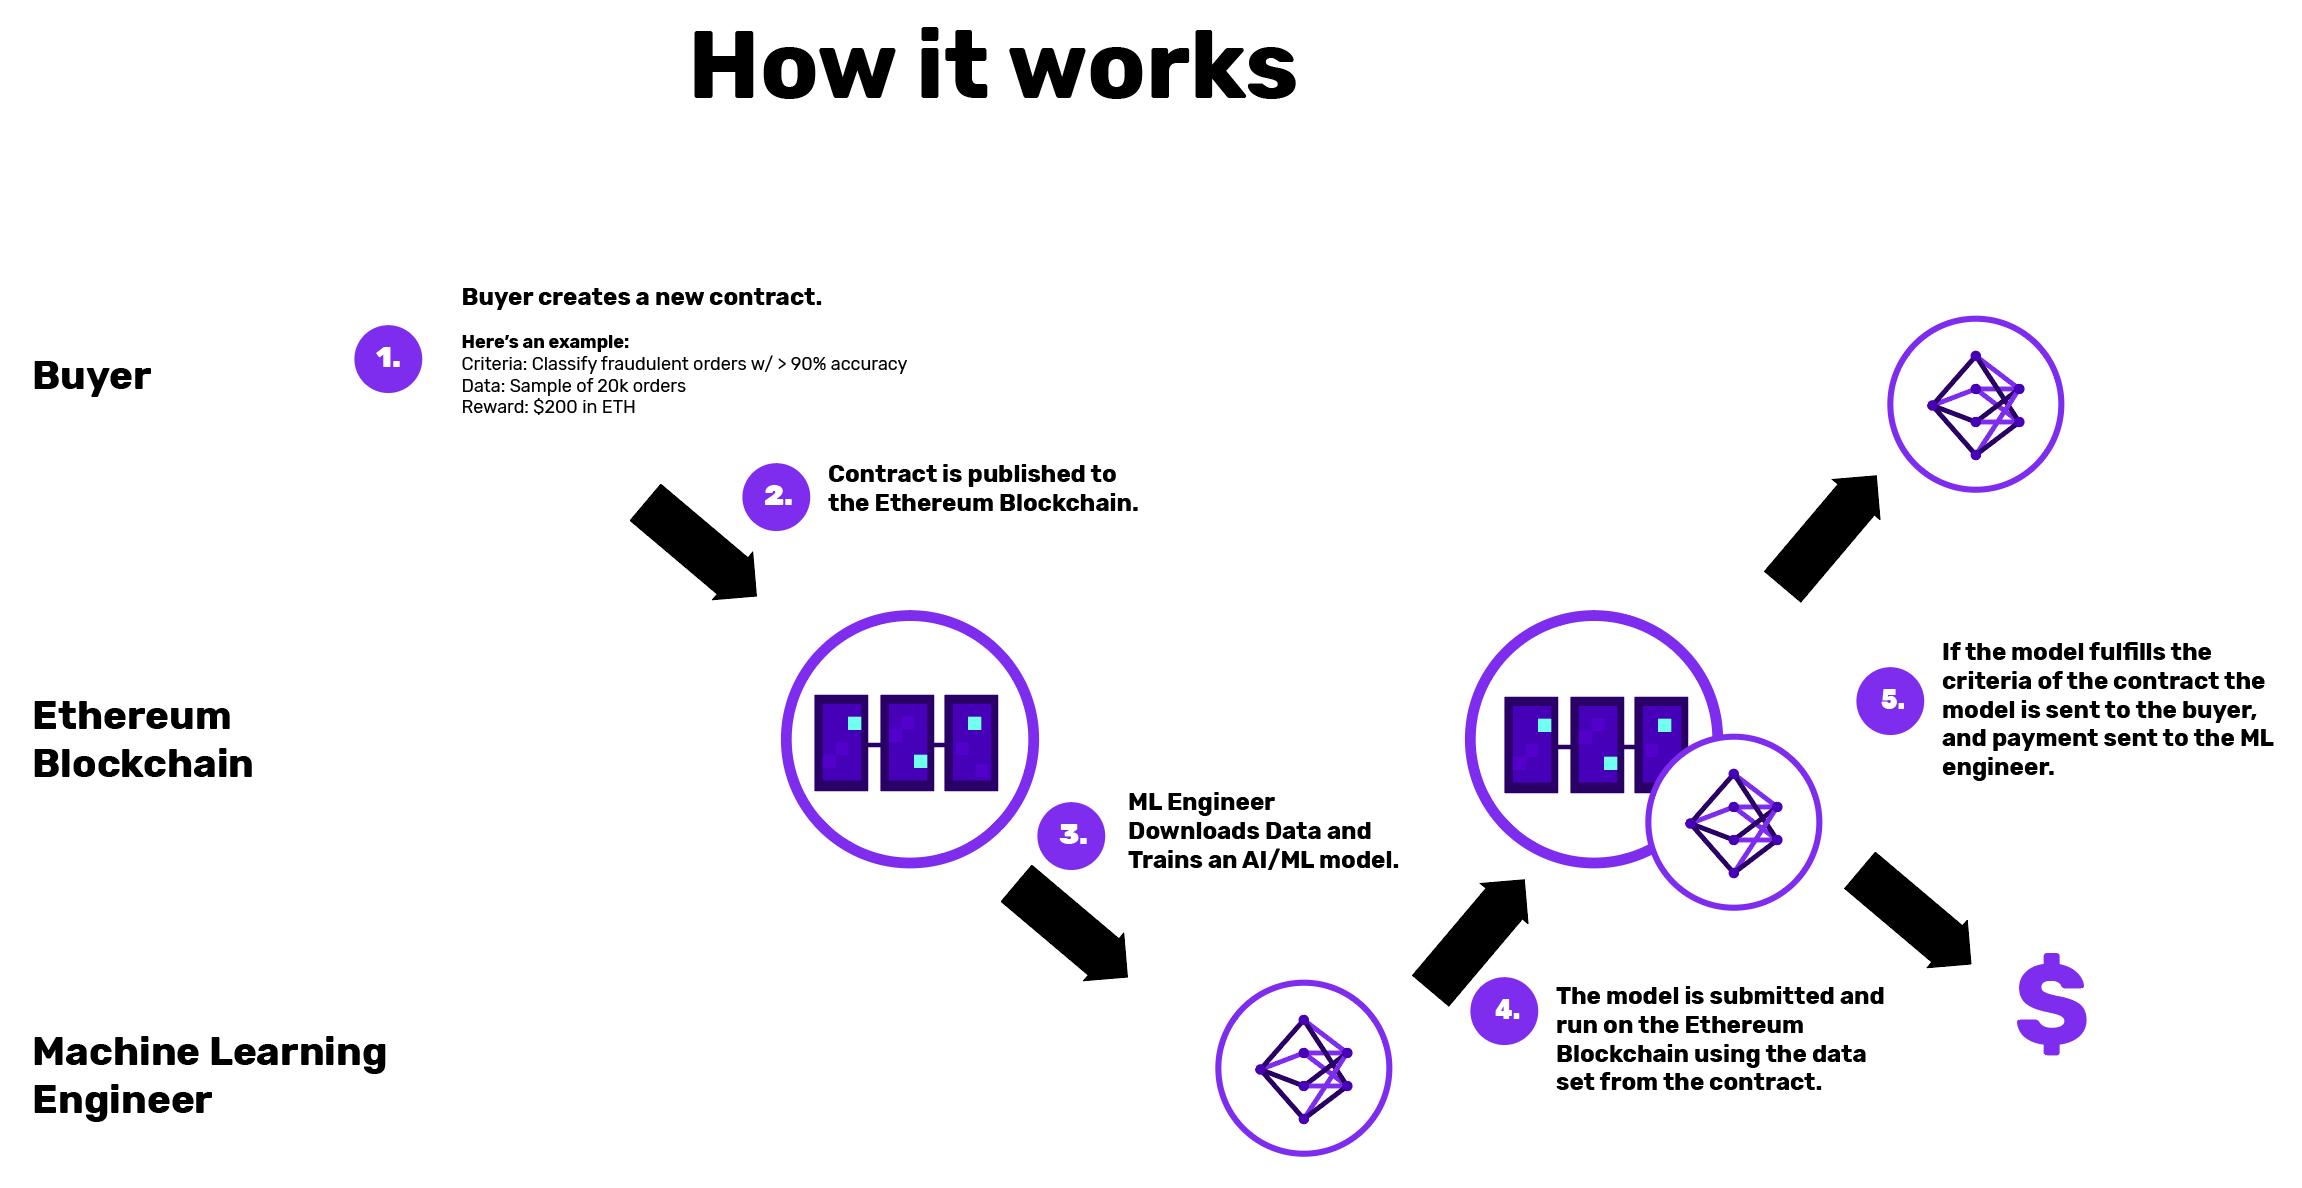 Algorithmia launches Ethereum based AI competition